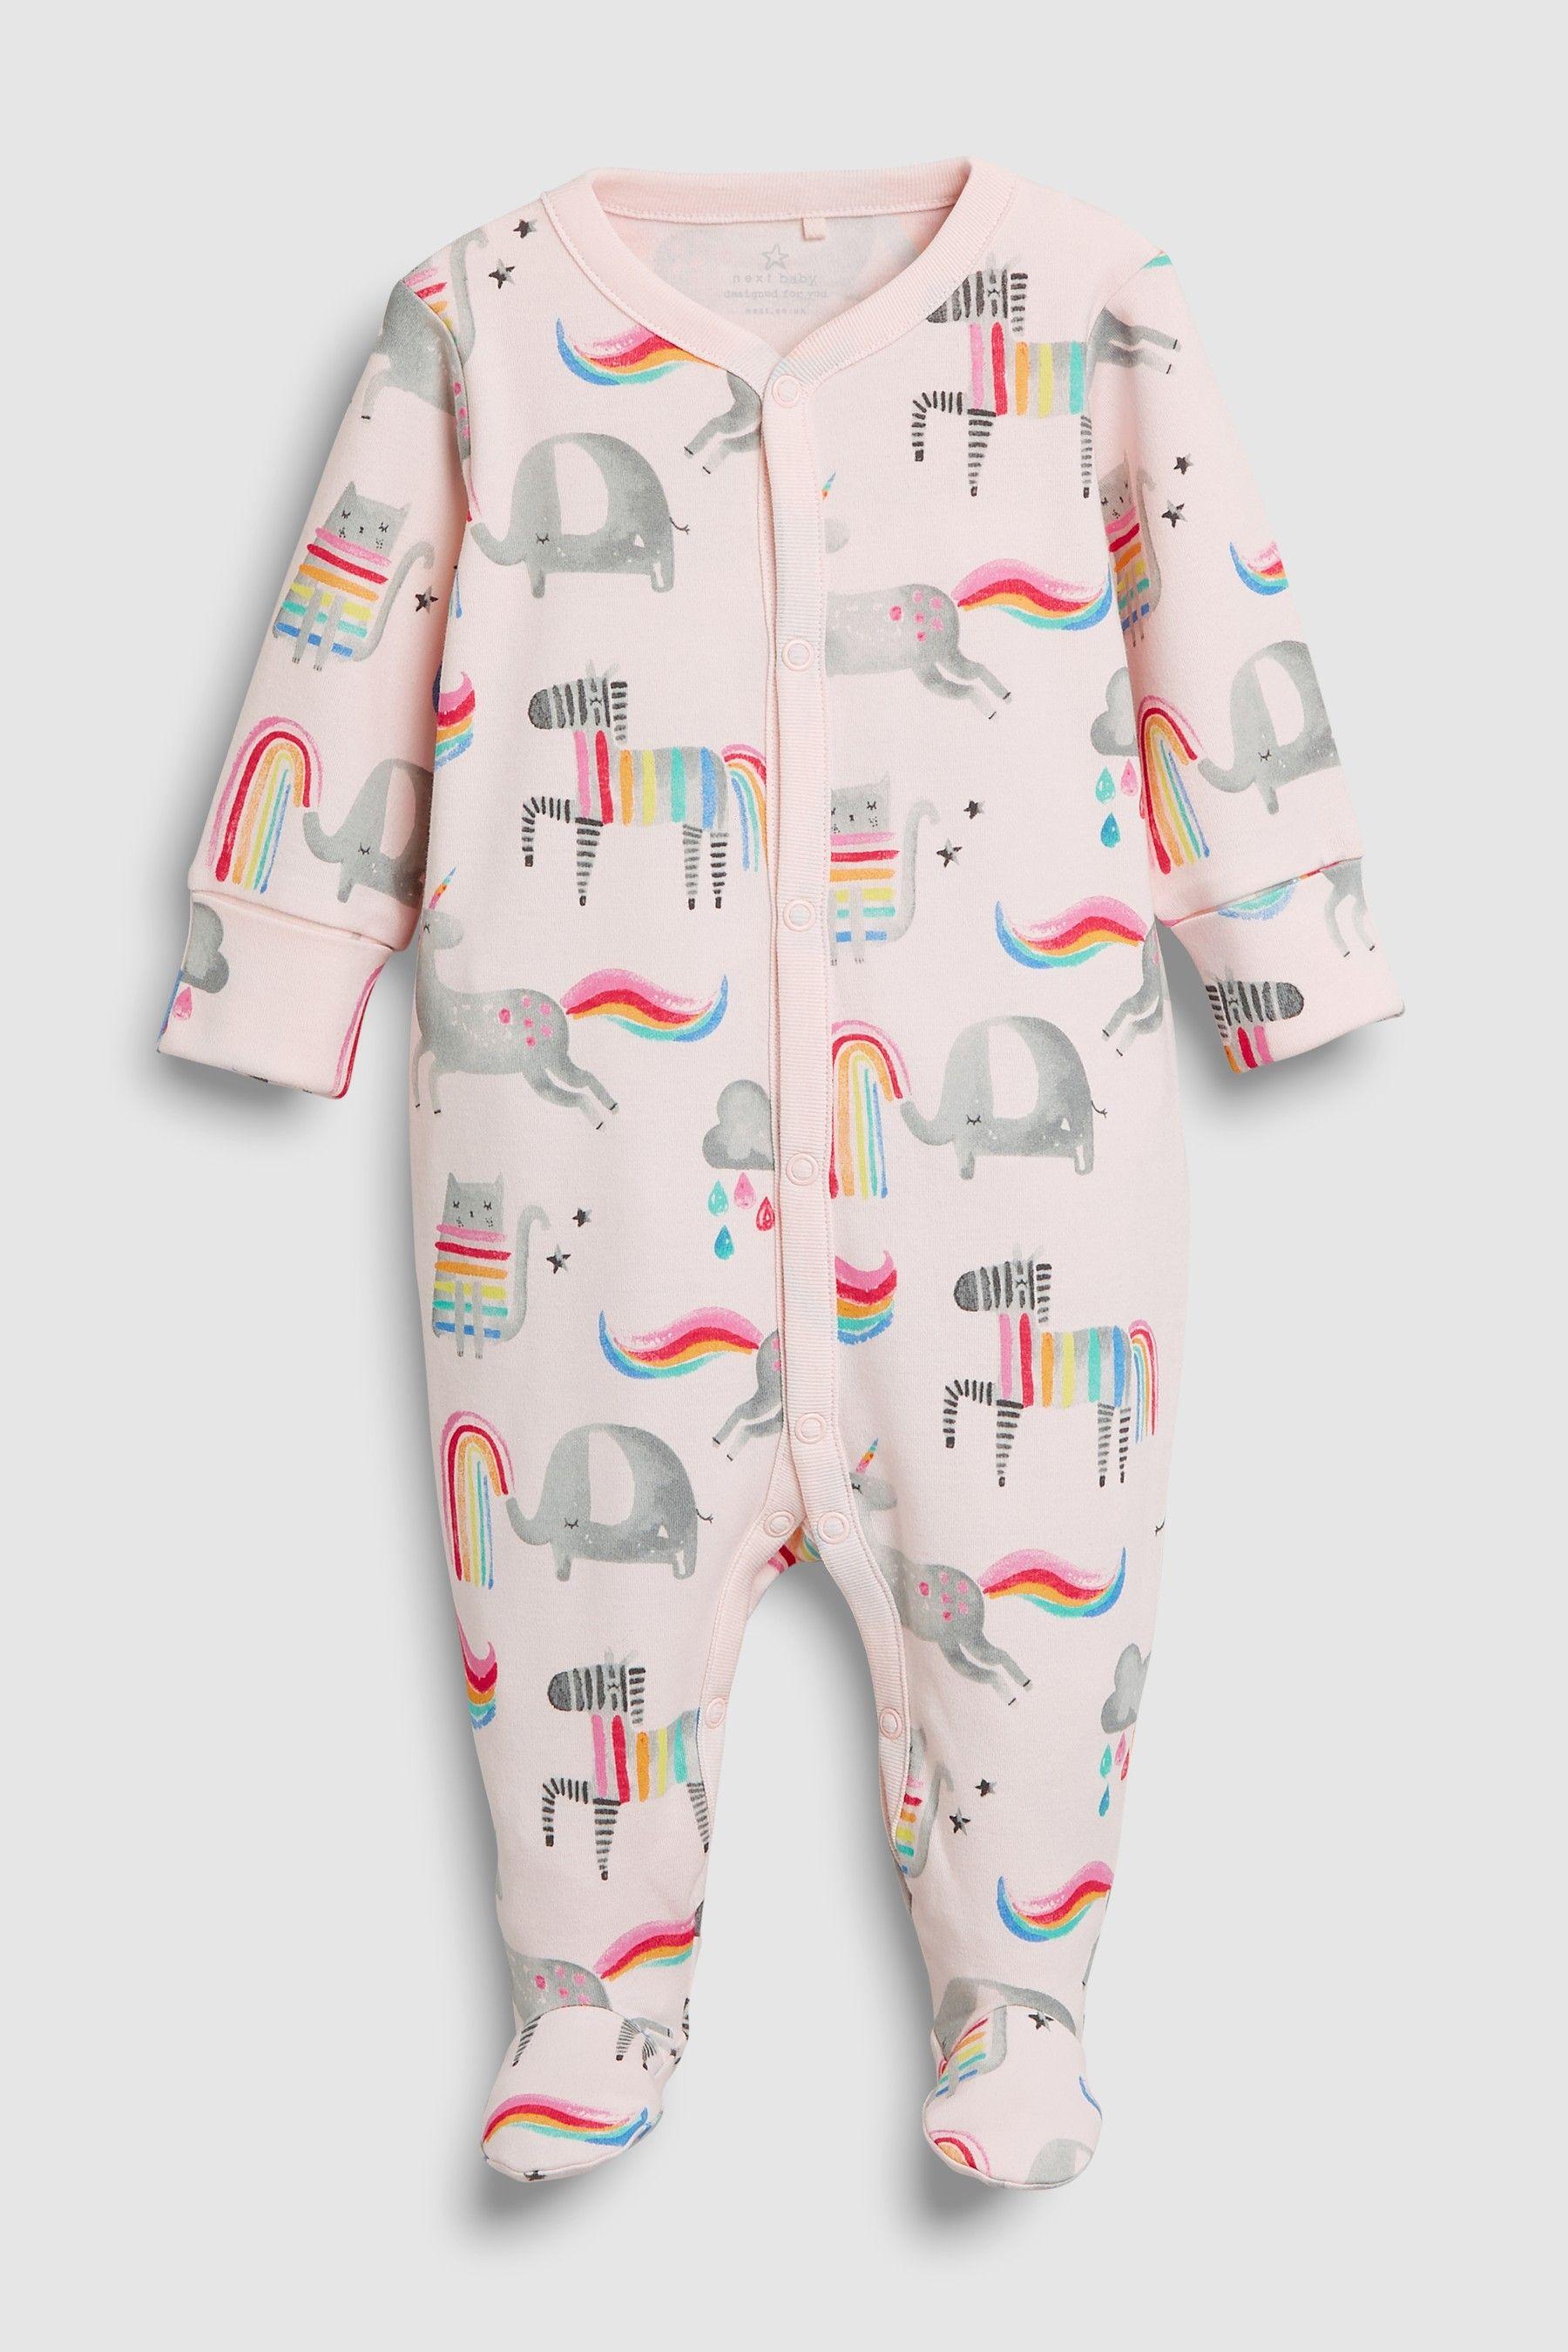 NurseryTime Baby 100/% Baumwolle Strampler Rosa Pink gr 50 56 62 68 Englandmode